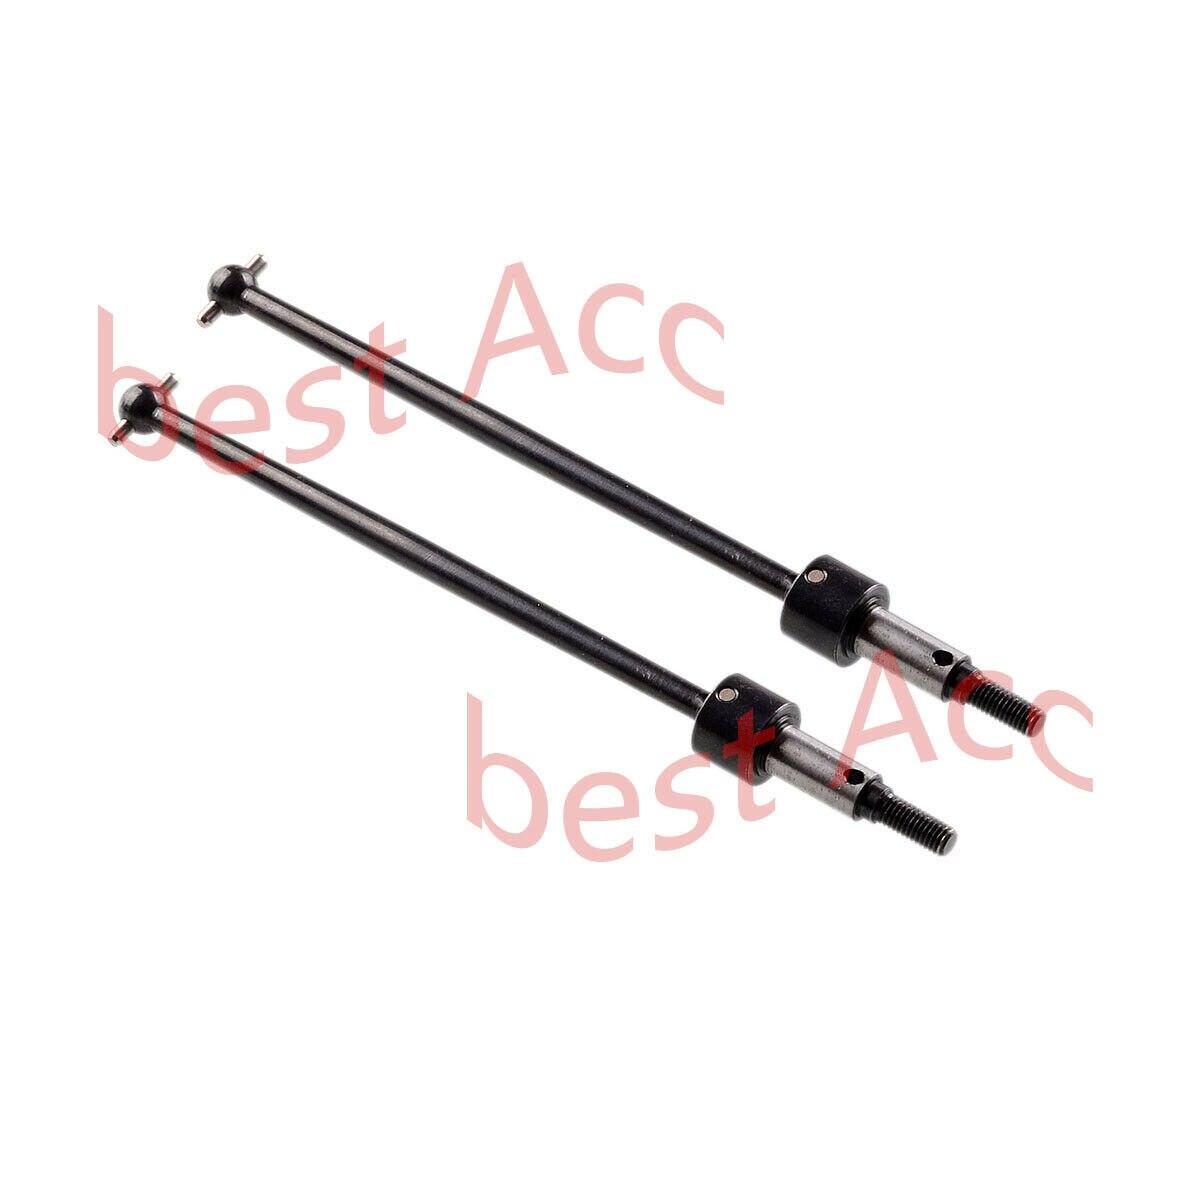 Rear Aluminum 98mm Shock Absorber w//4mm shaft For HPI SAVAGE XS FLUX 2P Front